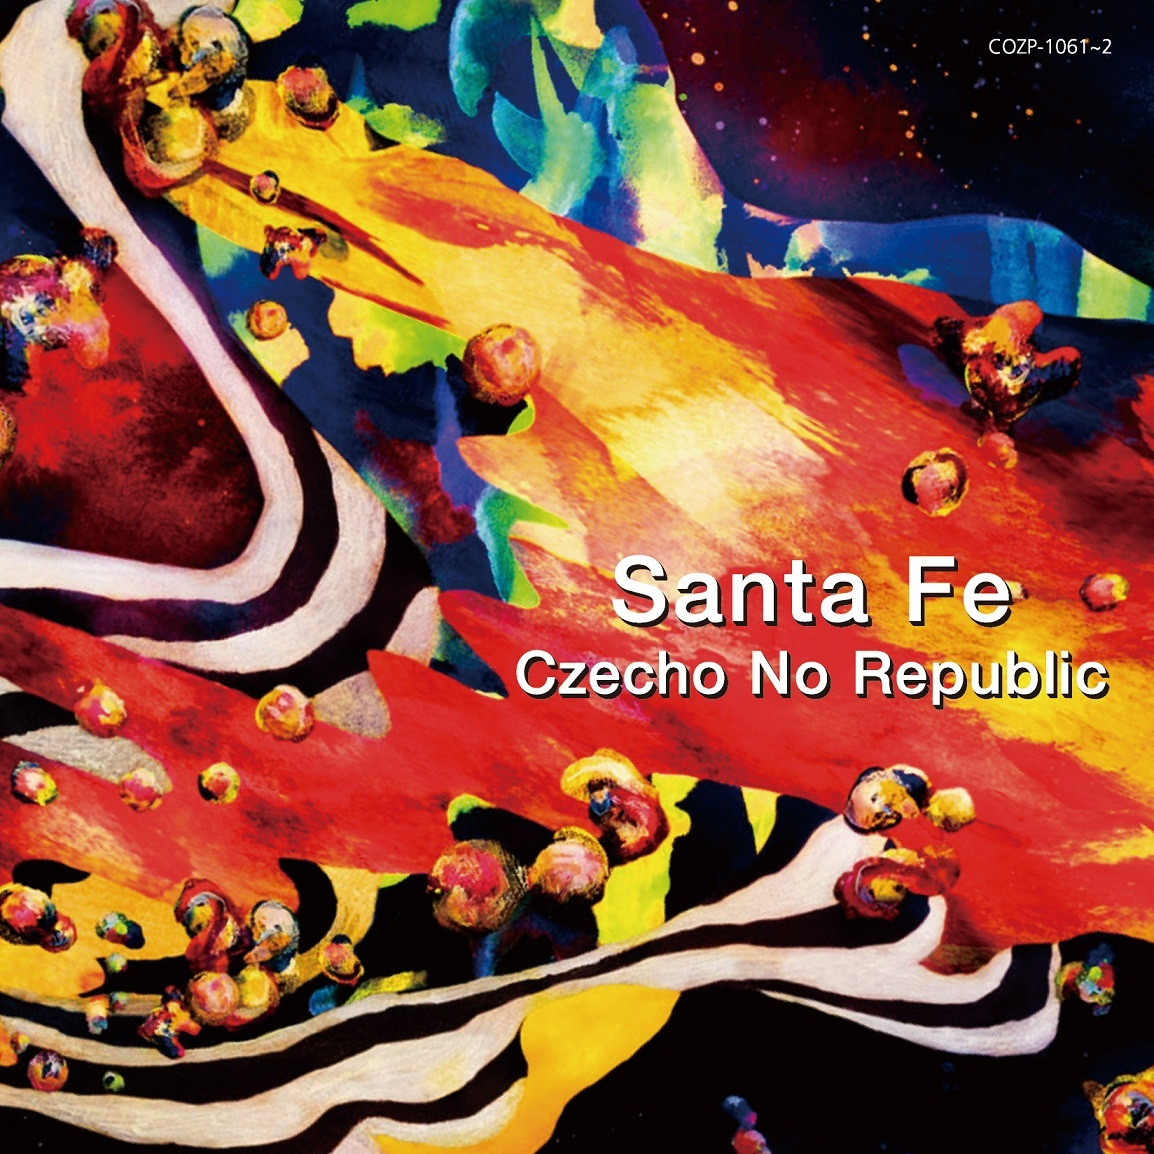 『Santa Fe』初回盤ジャケット